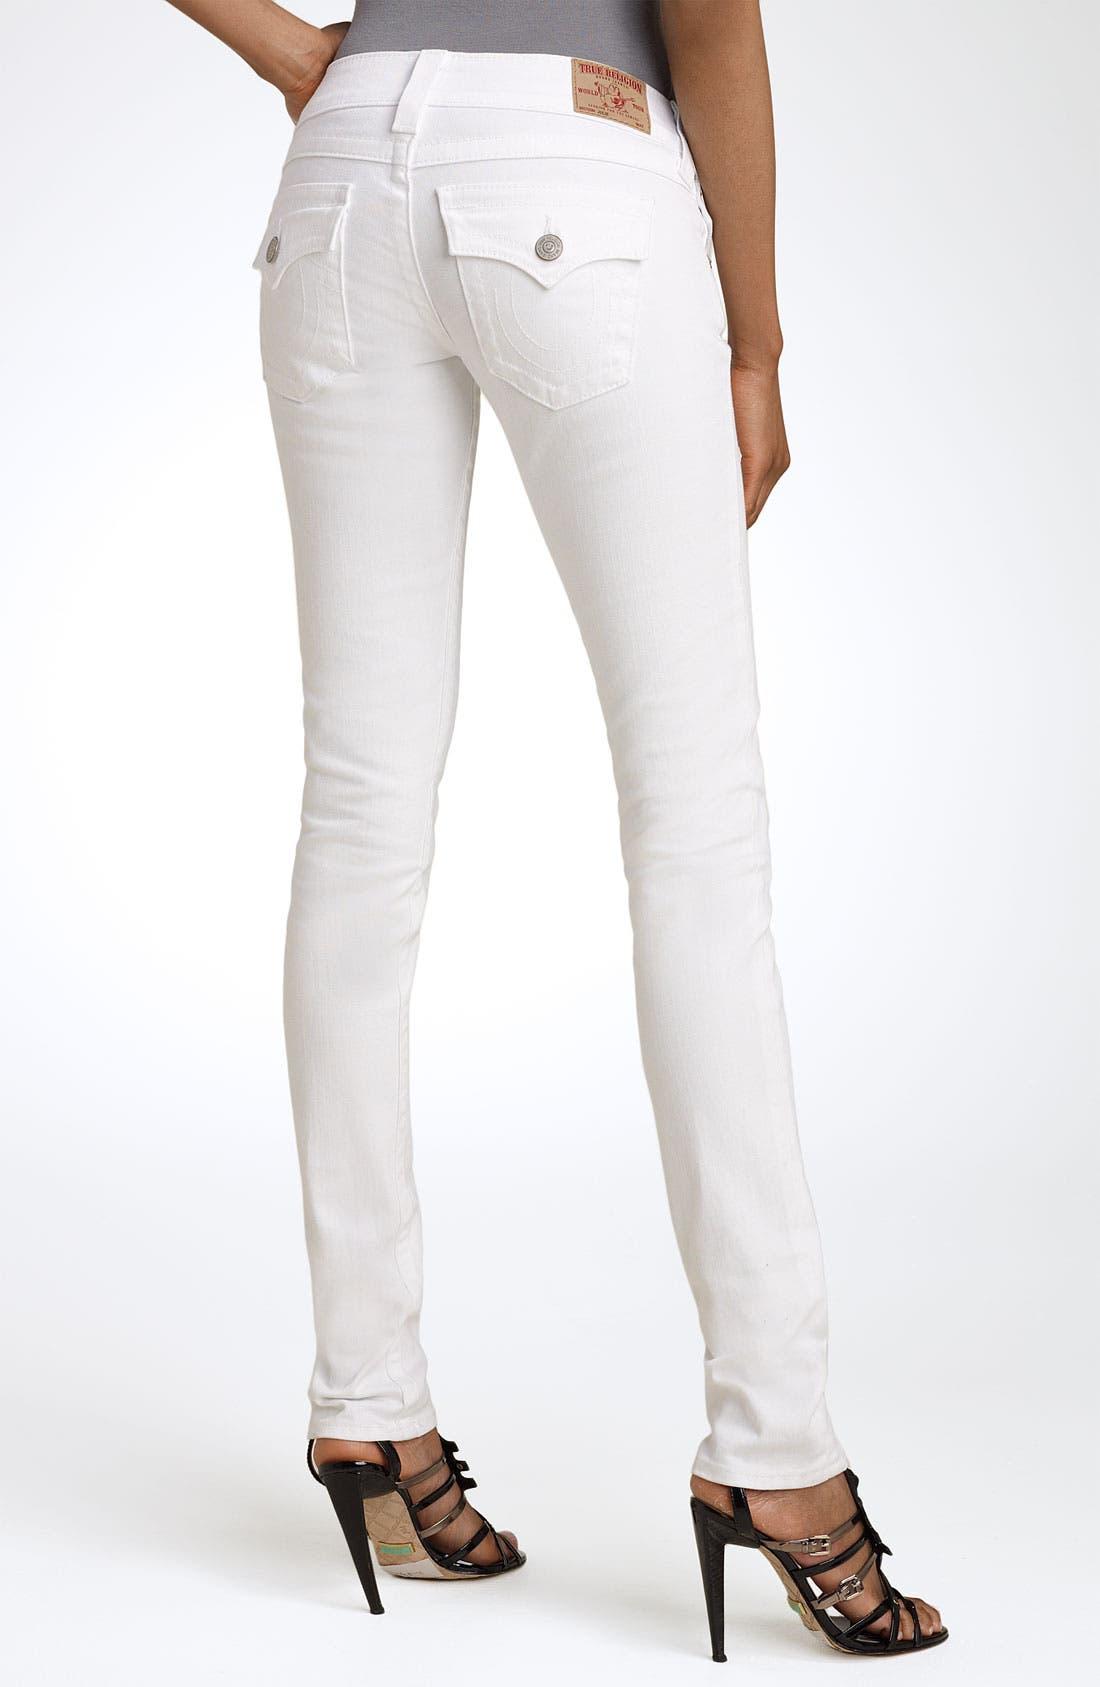 Alternate Image 1 Selected - True Religion Brand Jeans 'Julie' Skinny Stretch Jeans (Body Rinse White)